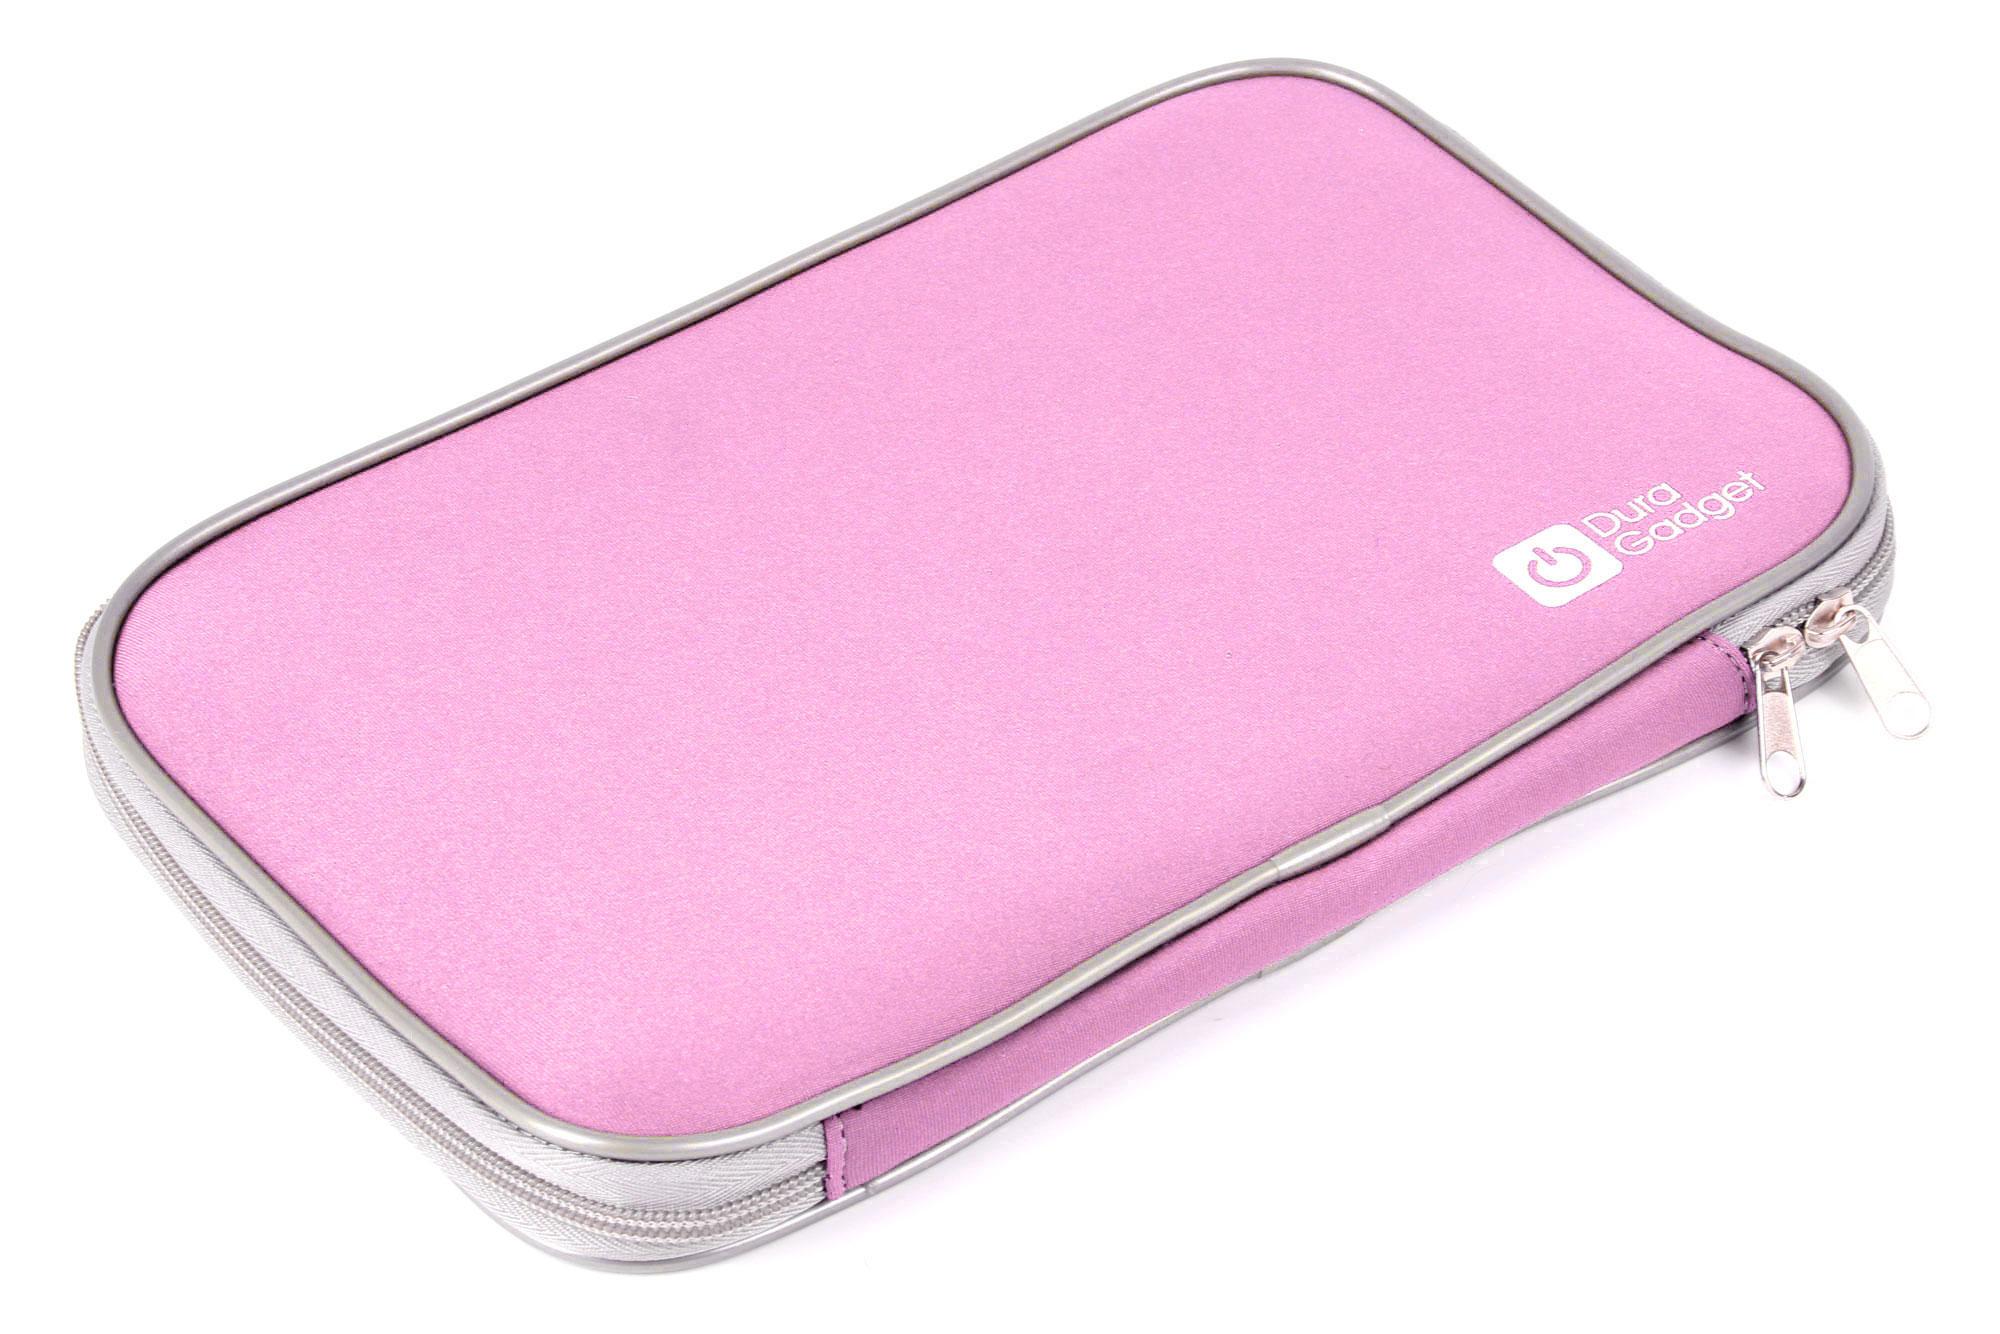 Stylish pink neoprene laptop case pocket for packard bell for Housse ordinateur portable originale